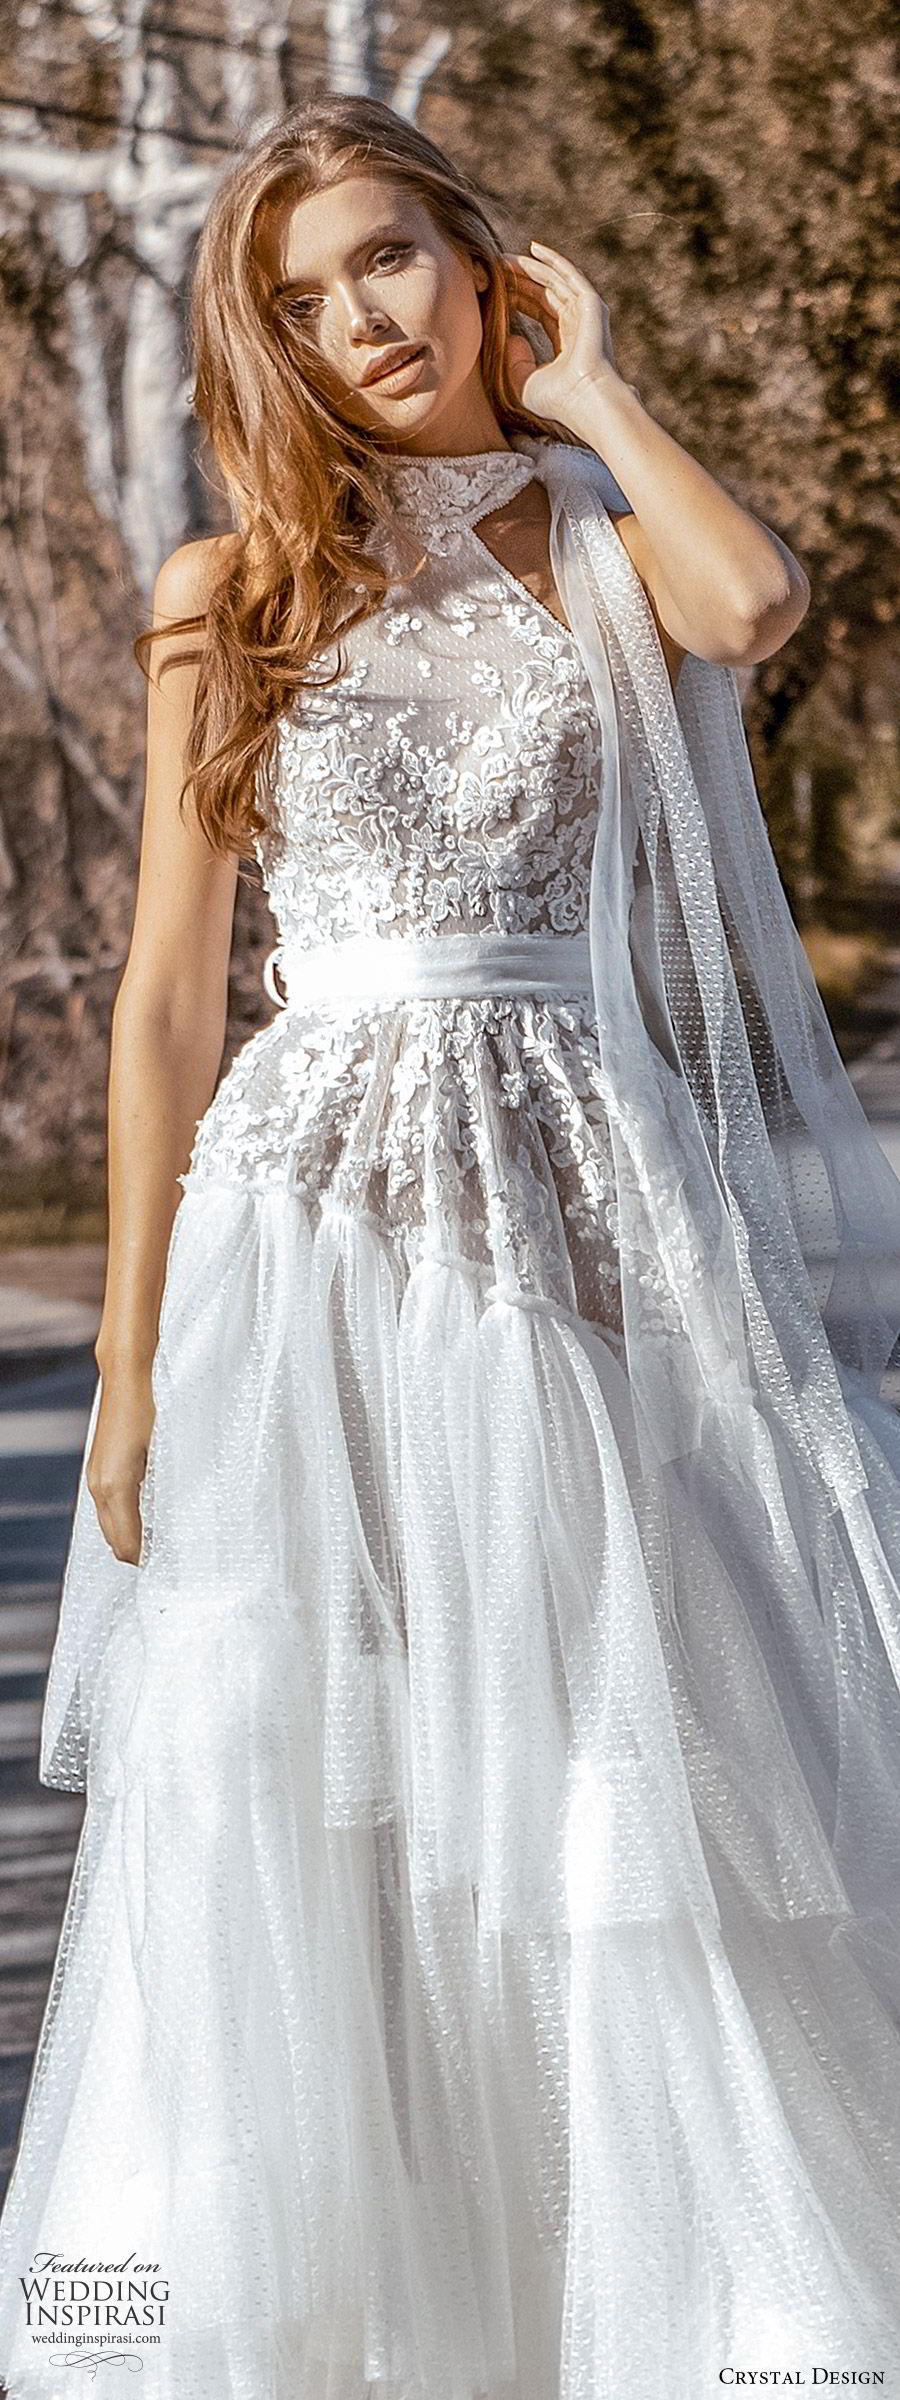 crystal design 2020 couture bridal sleeveless halter neck lace bodice drop waist ball gown wedding dress (6) romantic boho chic chapel train lv